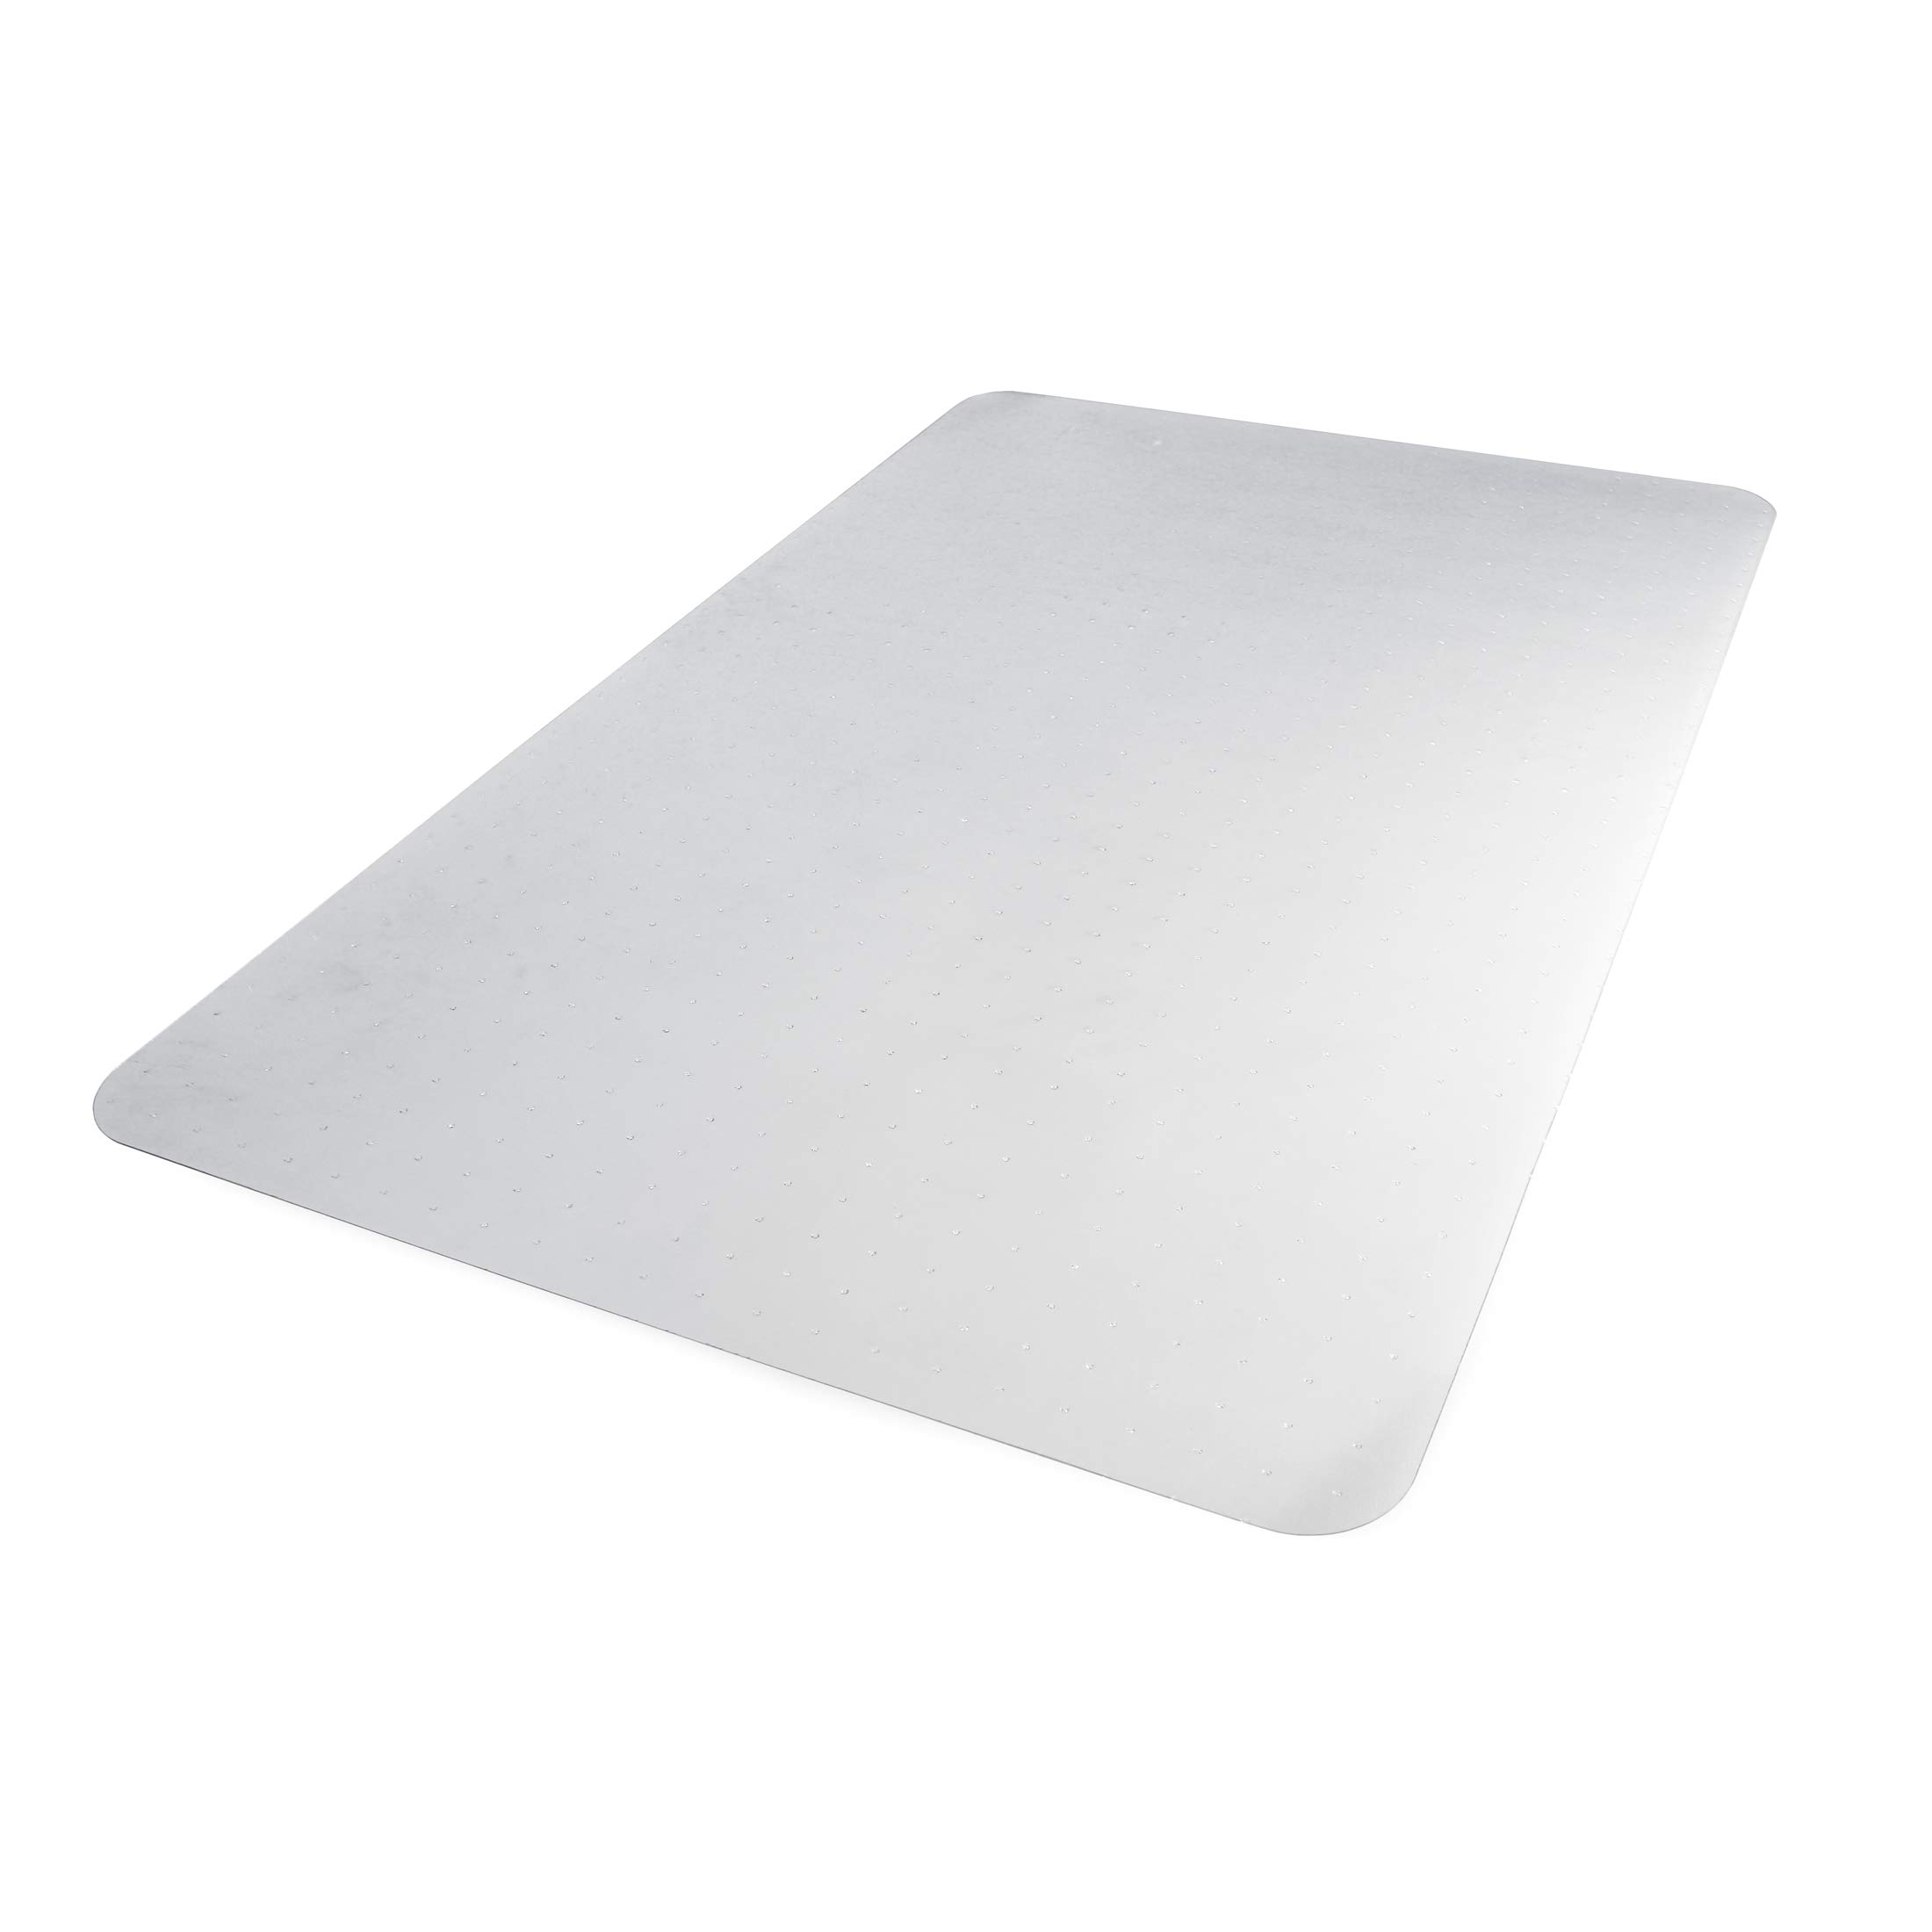 AmazonBasics Polycarbonate Office Carpet Chair Mat, for Thick Carpets, 35'' x 47''